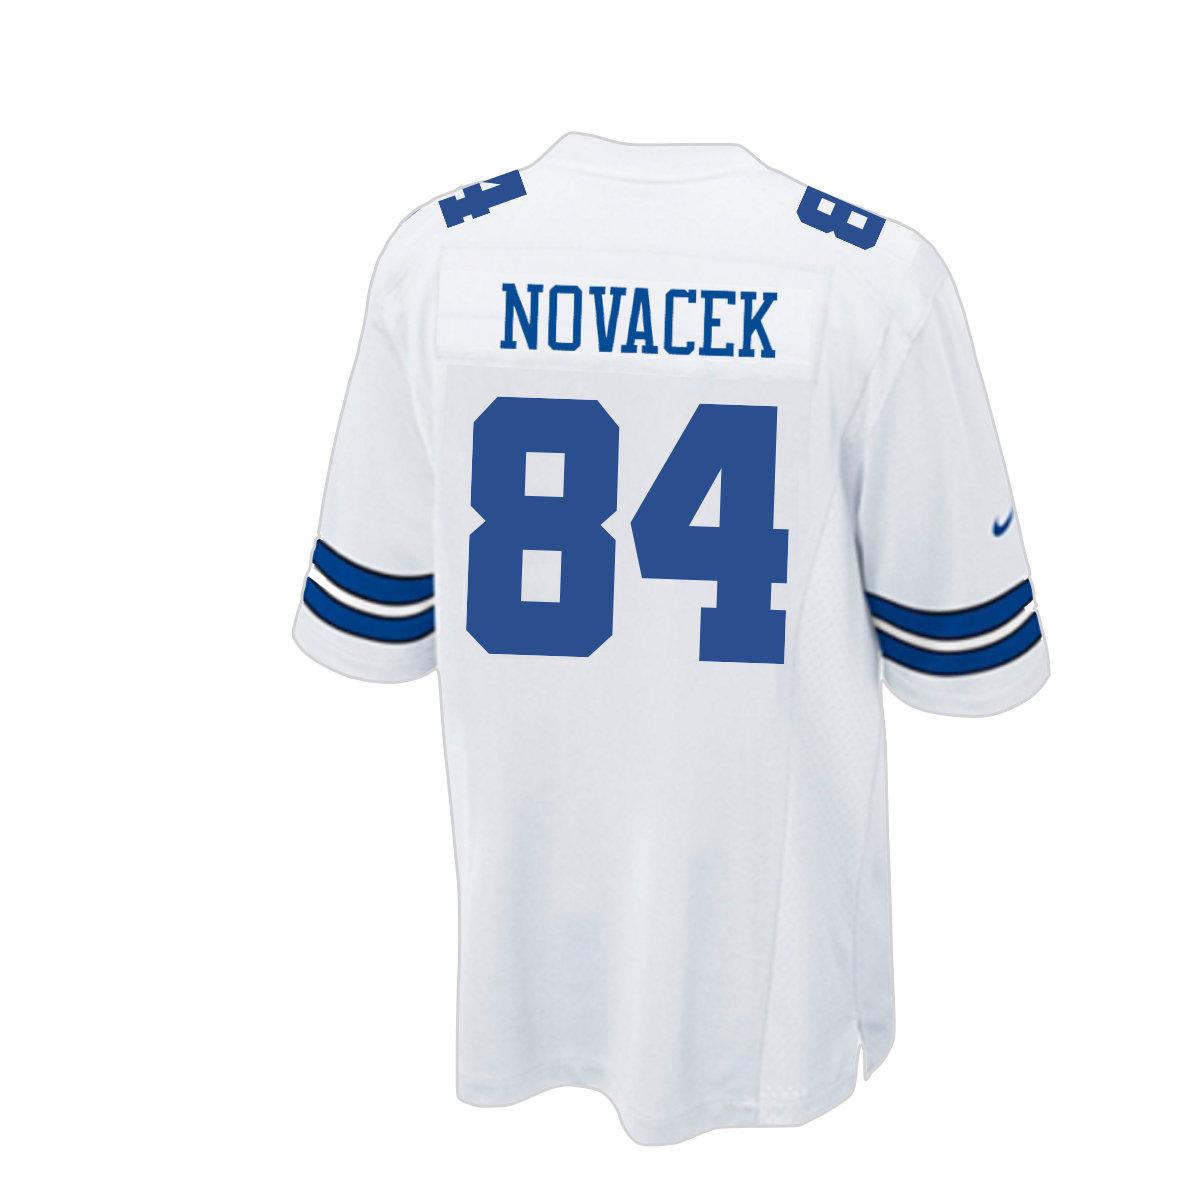 Jay Novacek Nike Game Replica Jersey | Cowboys Legends